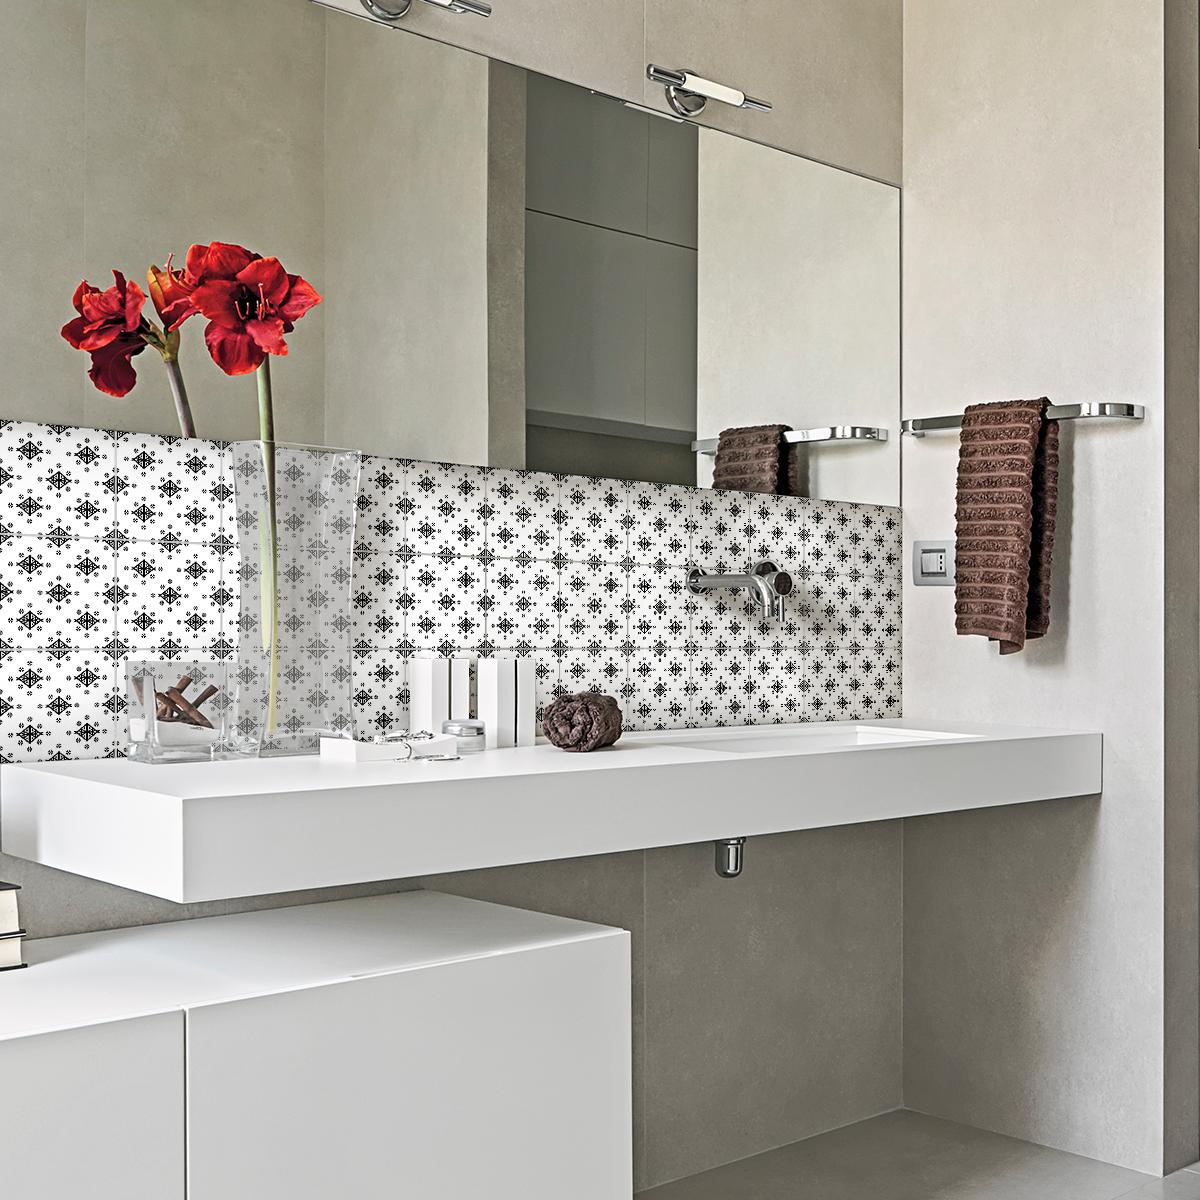 30 stickers carrelages ethnique kalemie cuisine. Black Bedroom Furniture Sets. Home Design Ideas